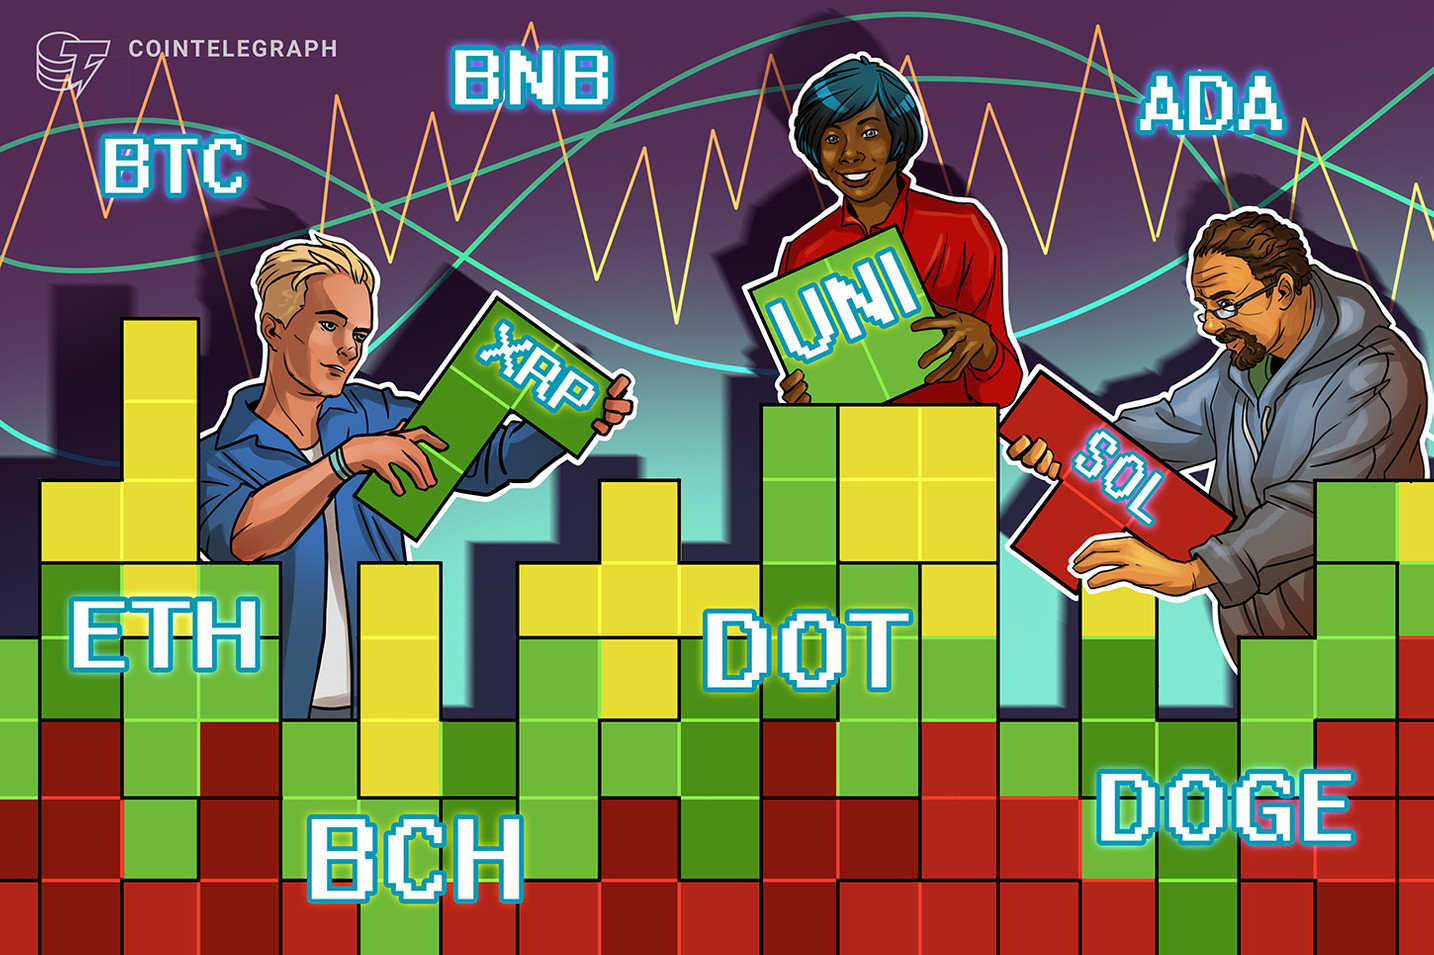 Análisis de precios del 20 de agosto: BTC, ETH, ADA, BNB, XRP, DOGE, DOT, SOL, UNI, BCH